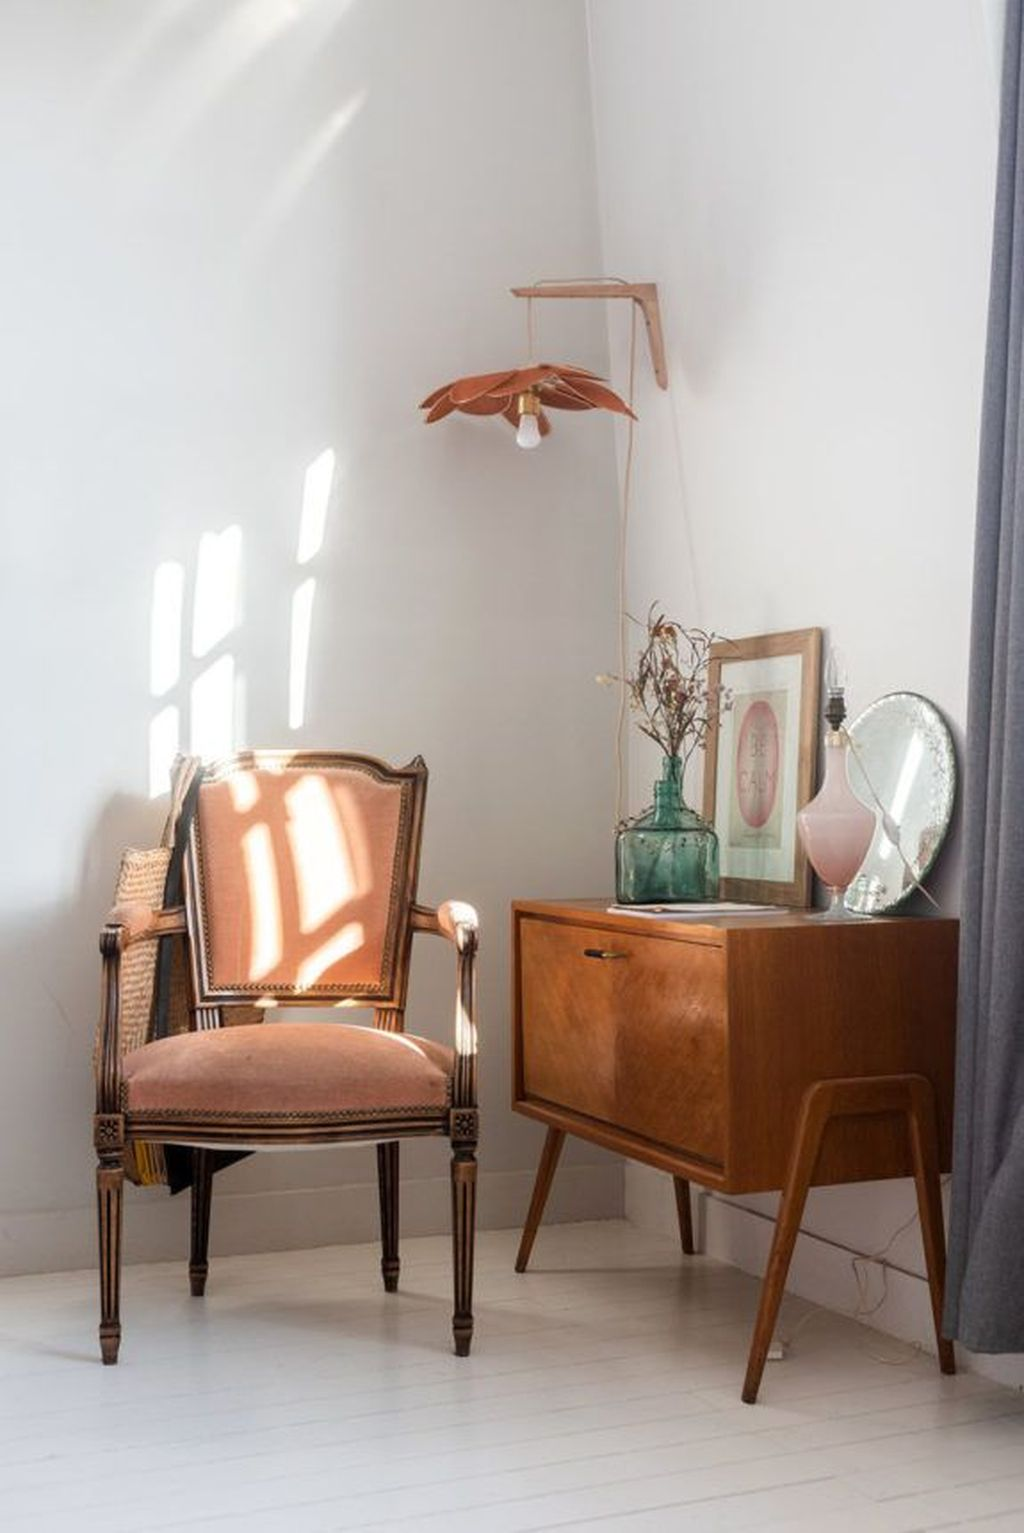 Inspiring Modern Home Furnishings Design Ideas 25